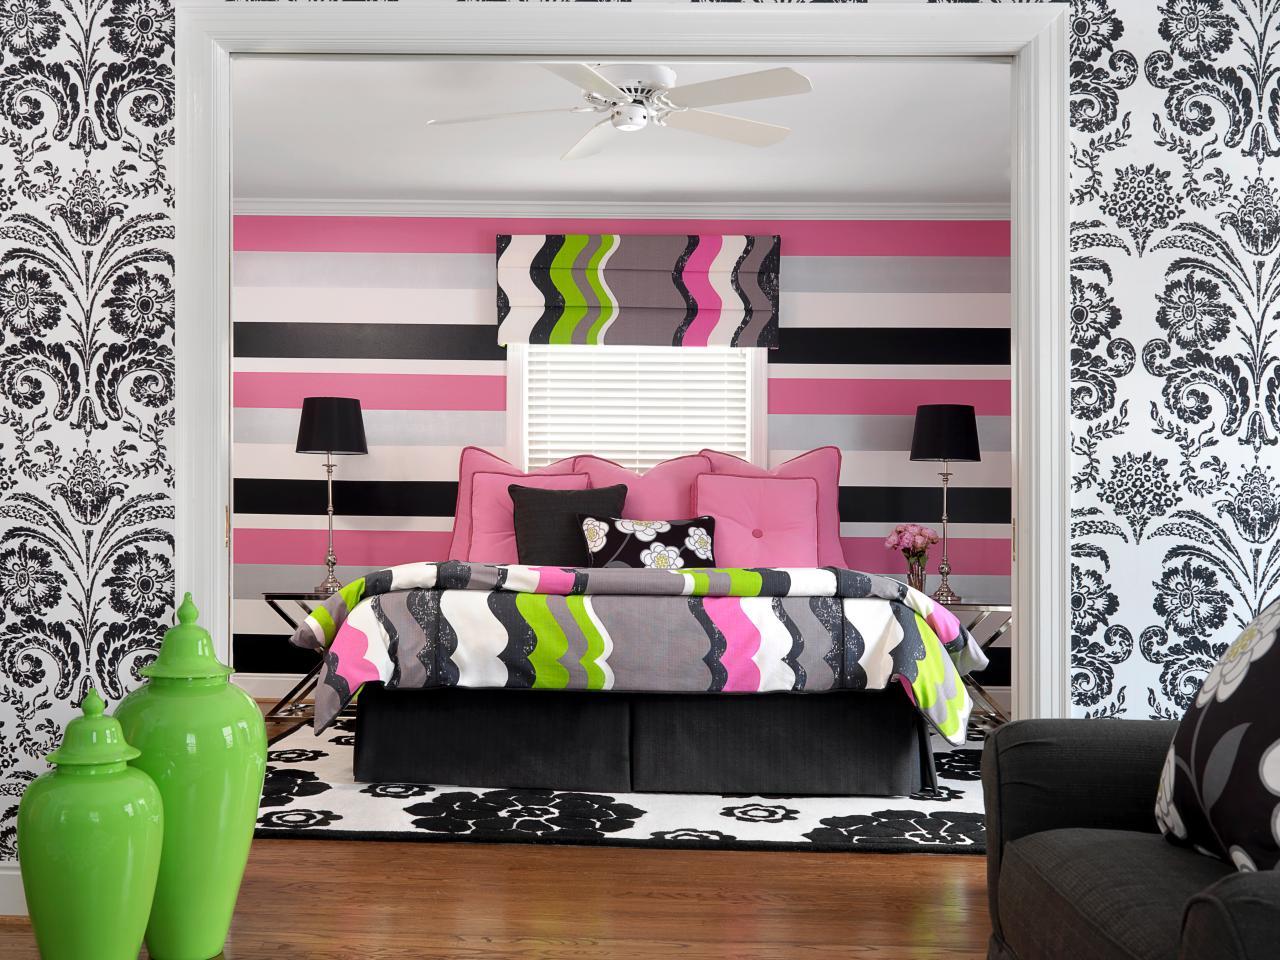 25 dise os que har n inspirarte para decorar tu habitaci n for Ideas para decorar